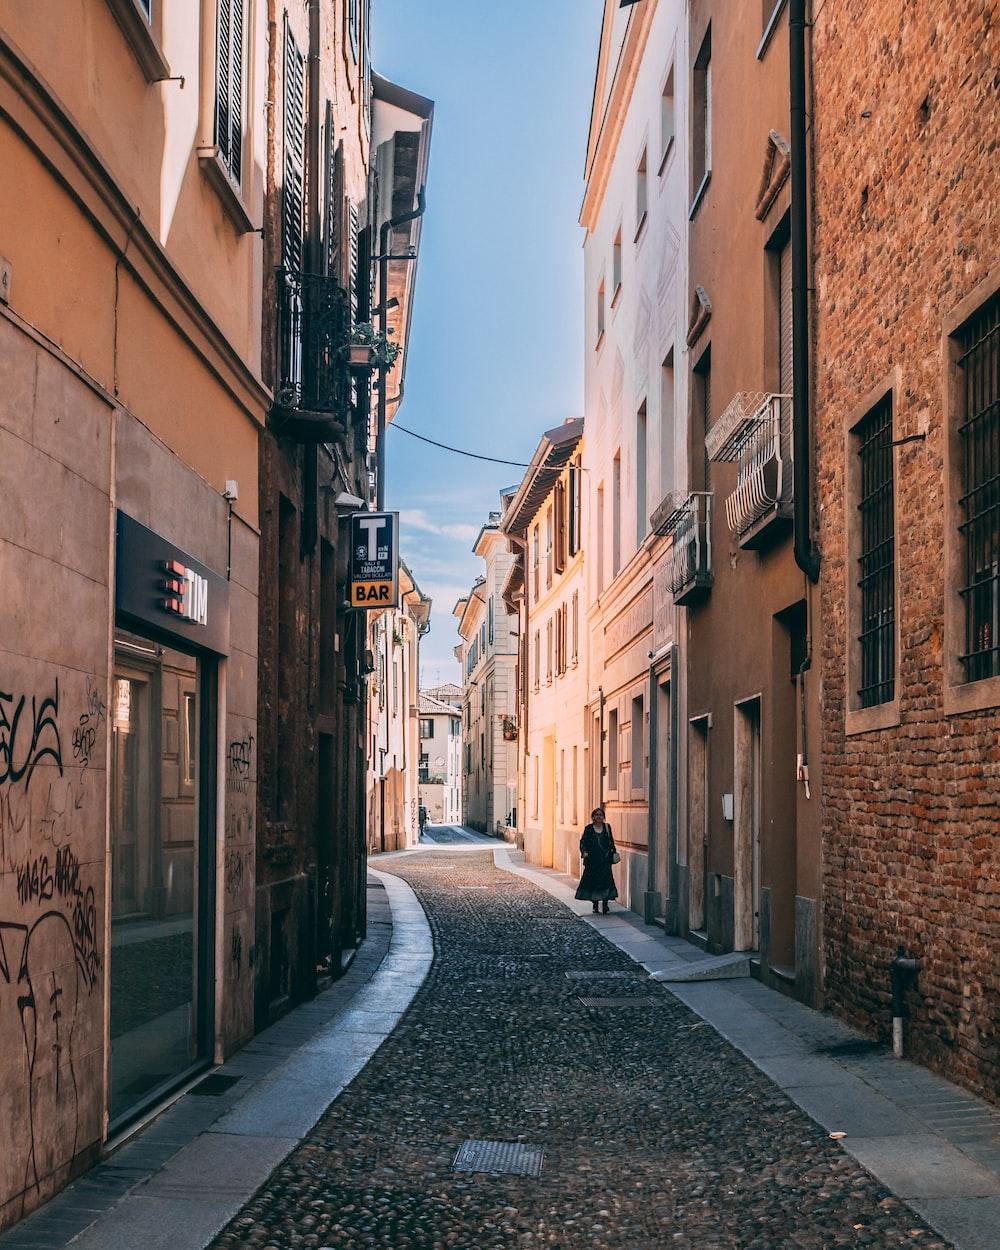 empty street between concrete buildings during daytime